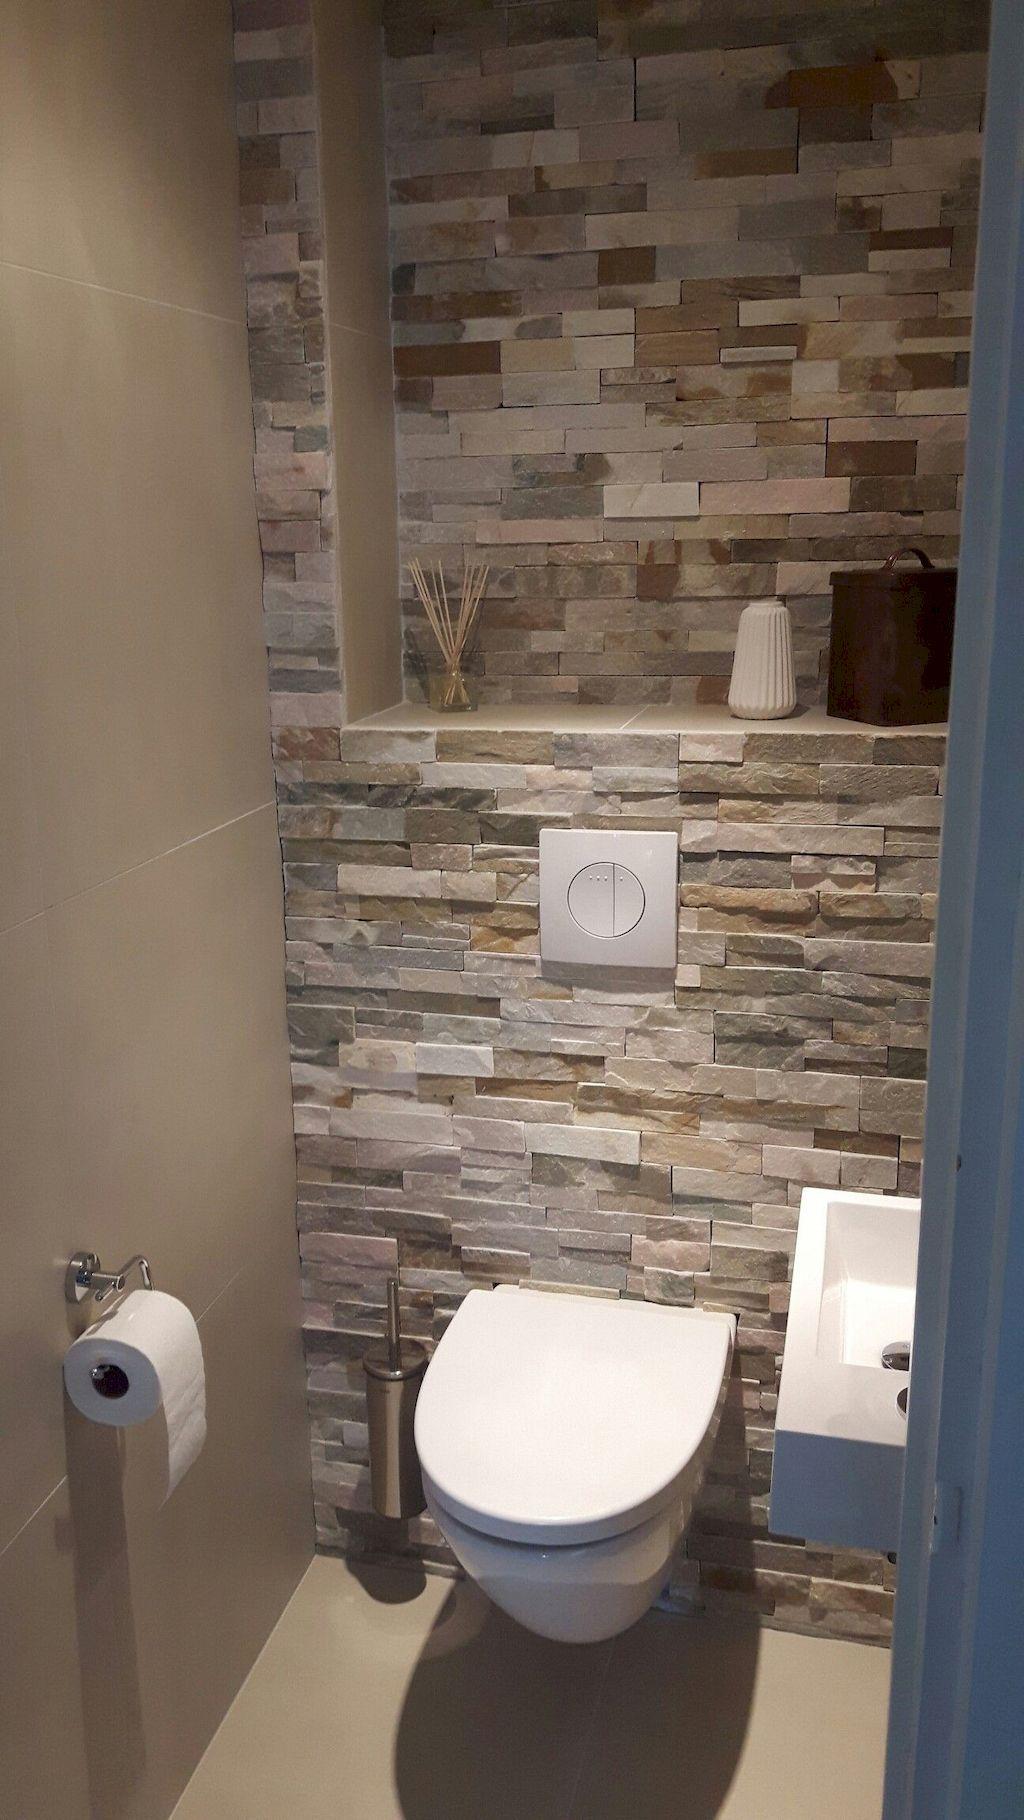 Space Saving Toilet Design For Small Bathroom Home To Z Small Toilet Room Space Saving Toilet Bathroom Design Small